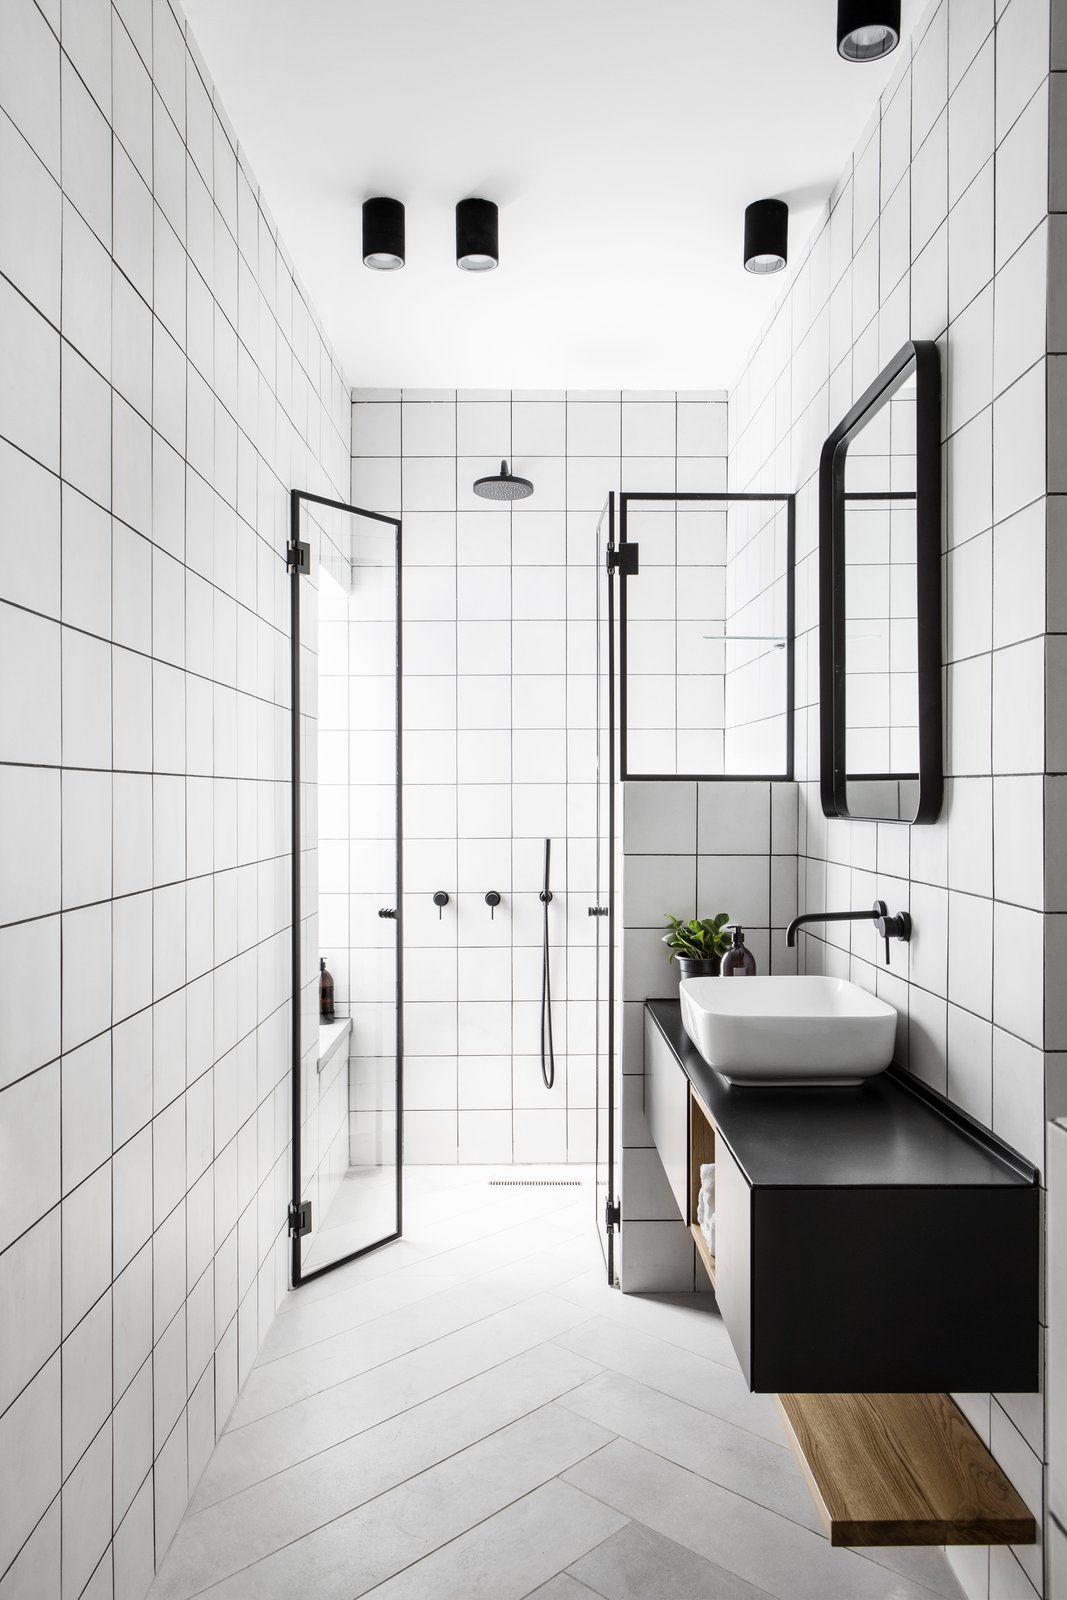 Bath room geometric monochrome bathroom photo of in nir am house by shir shtaigman also interior design rh pinterest